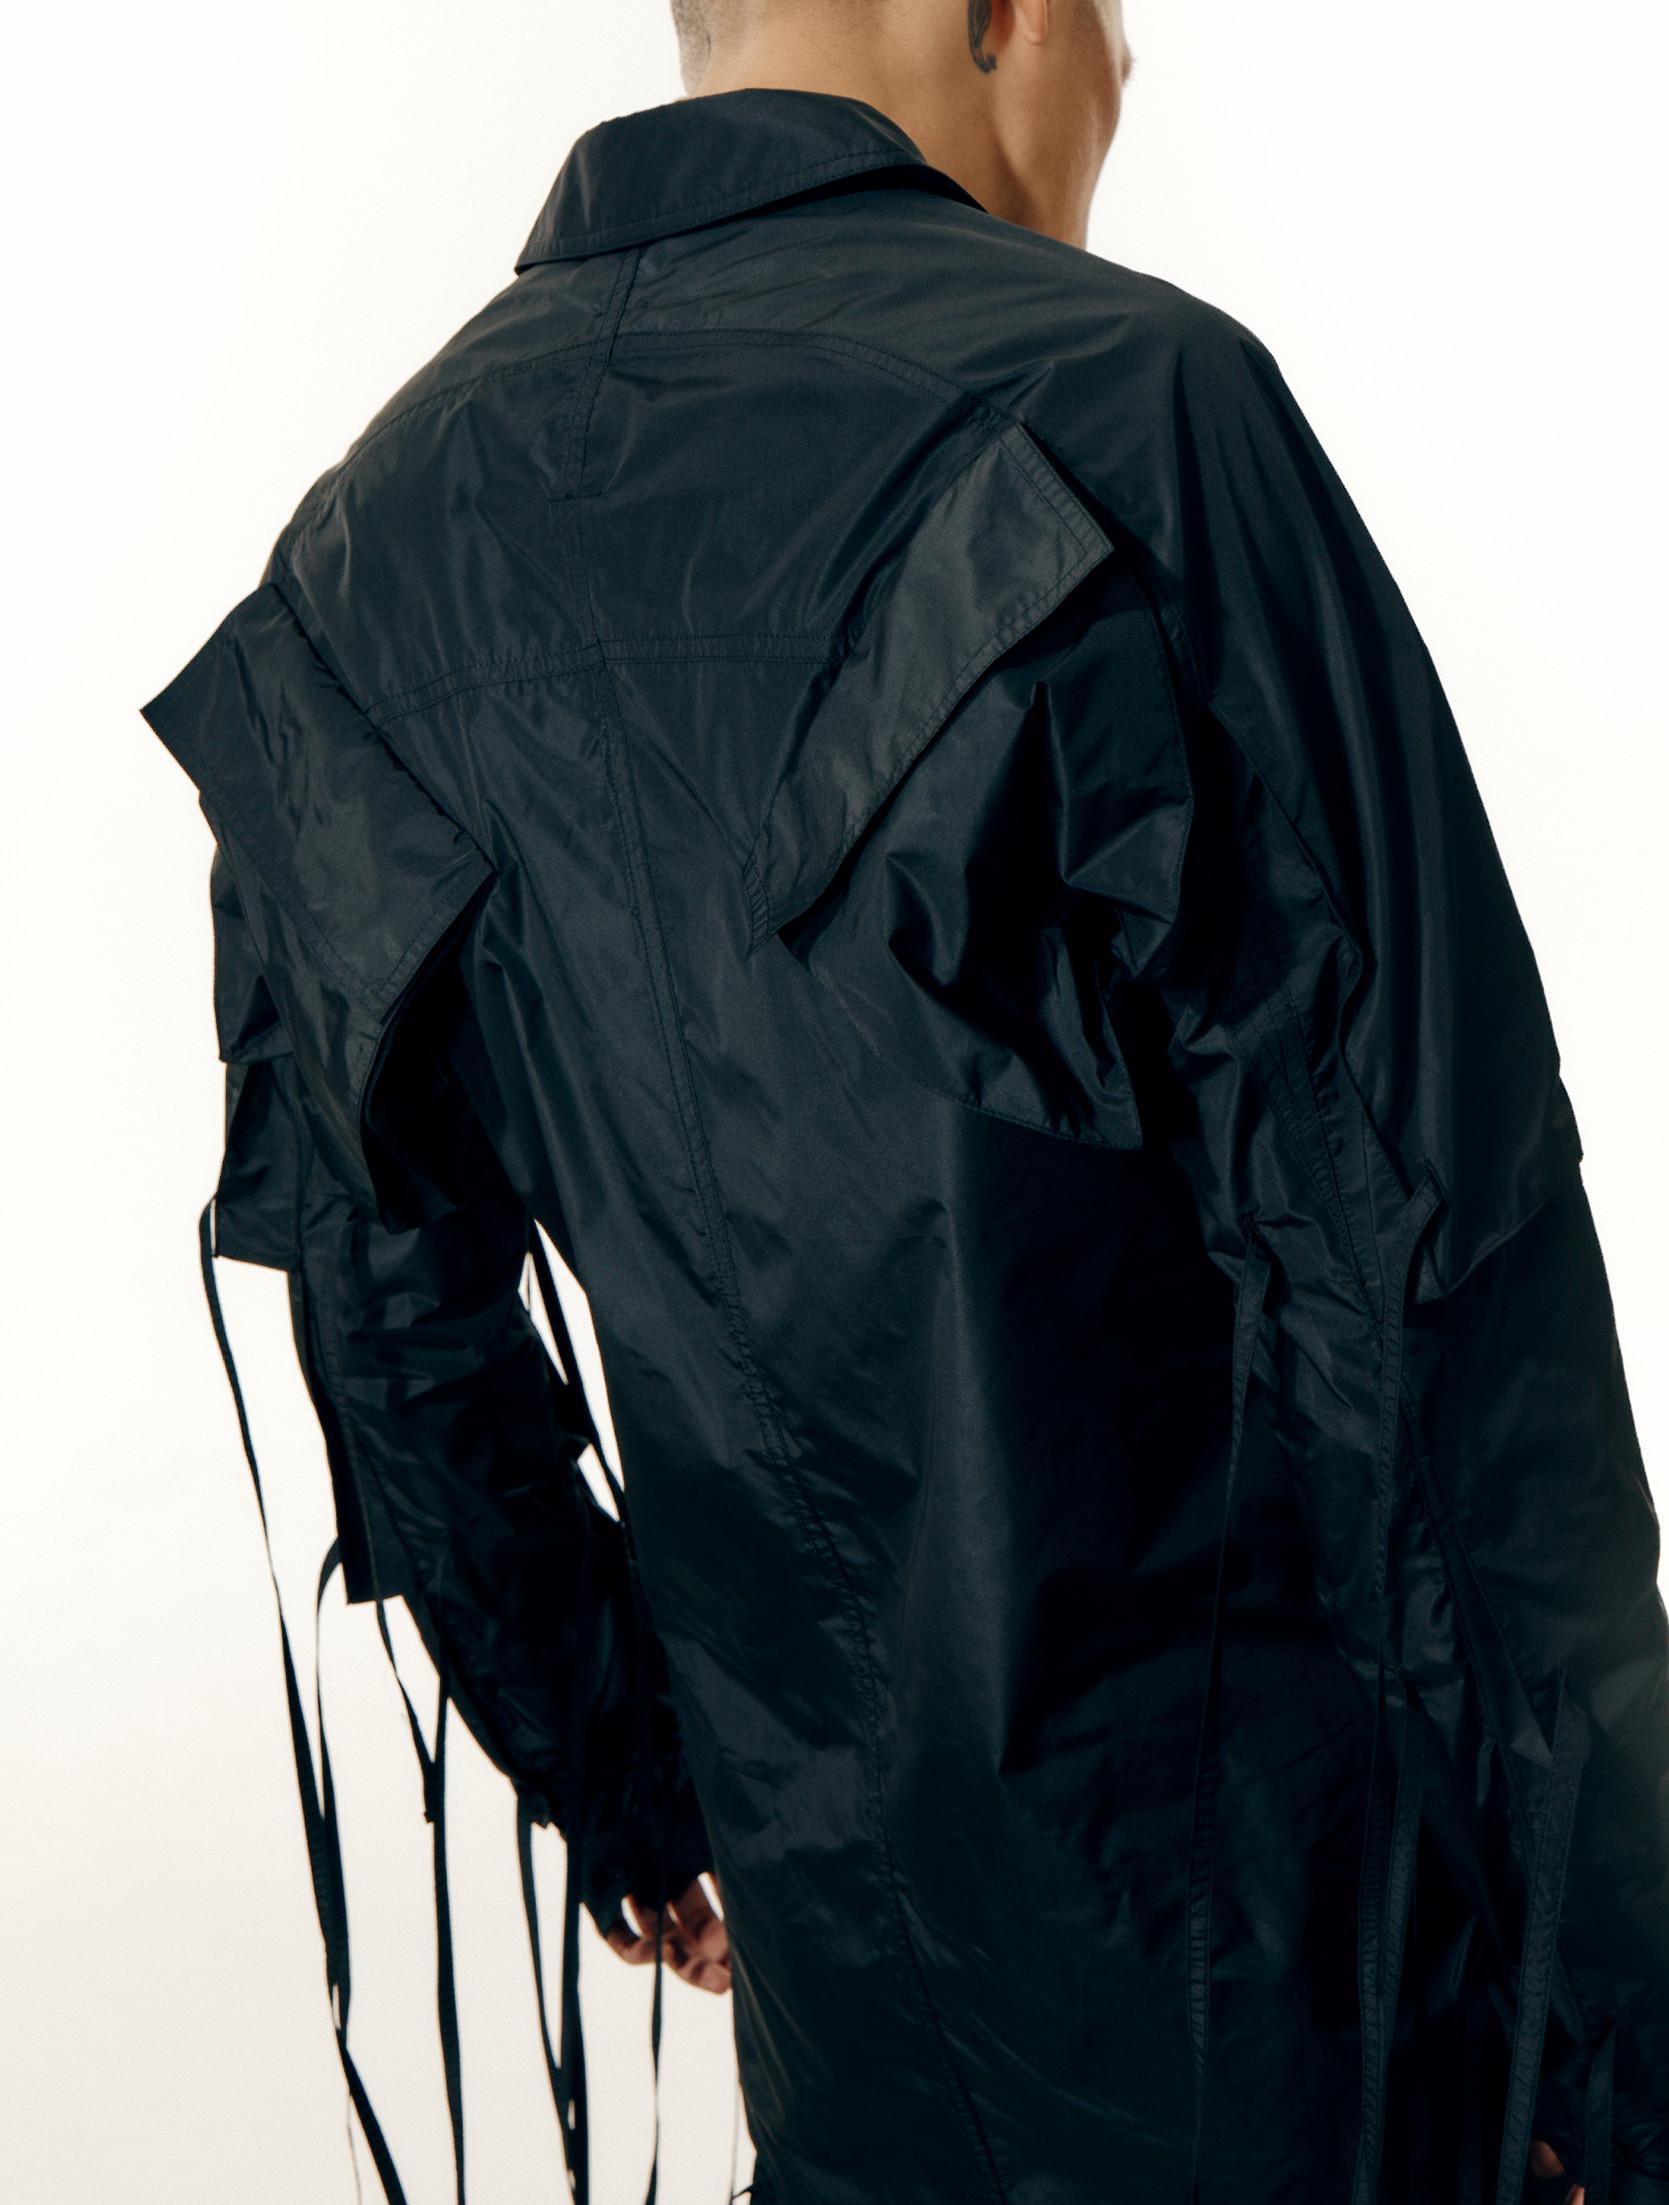 Black Strap Detailed Multi Pocket Shirts